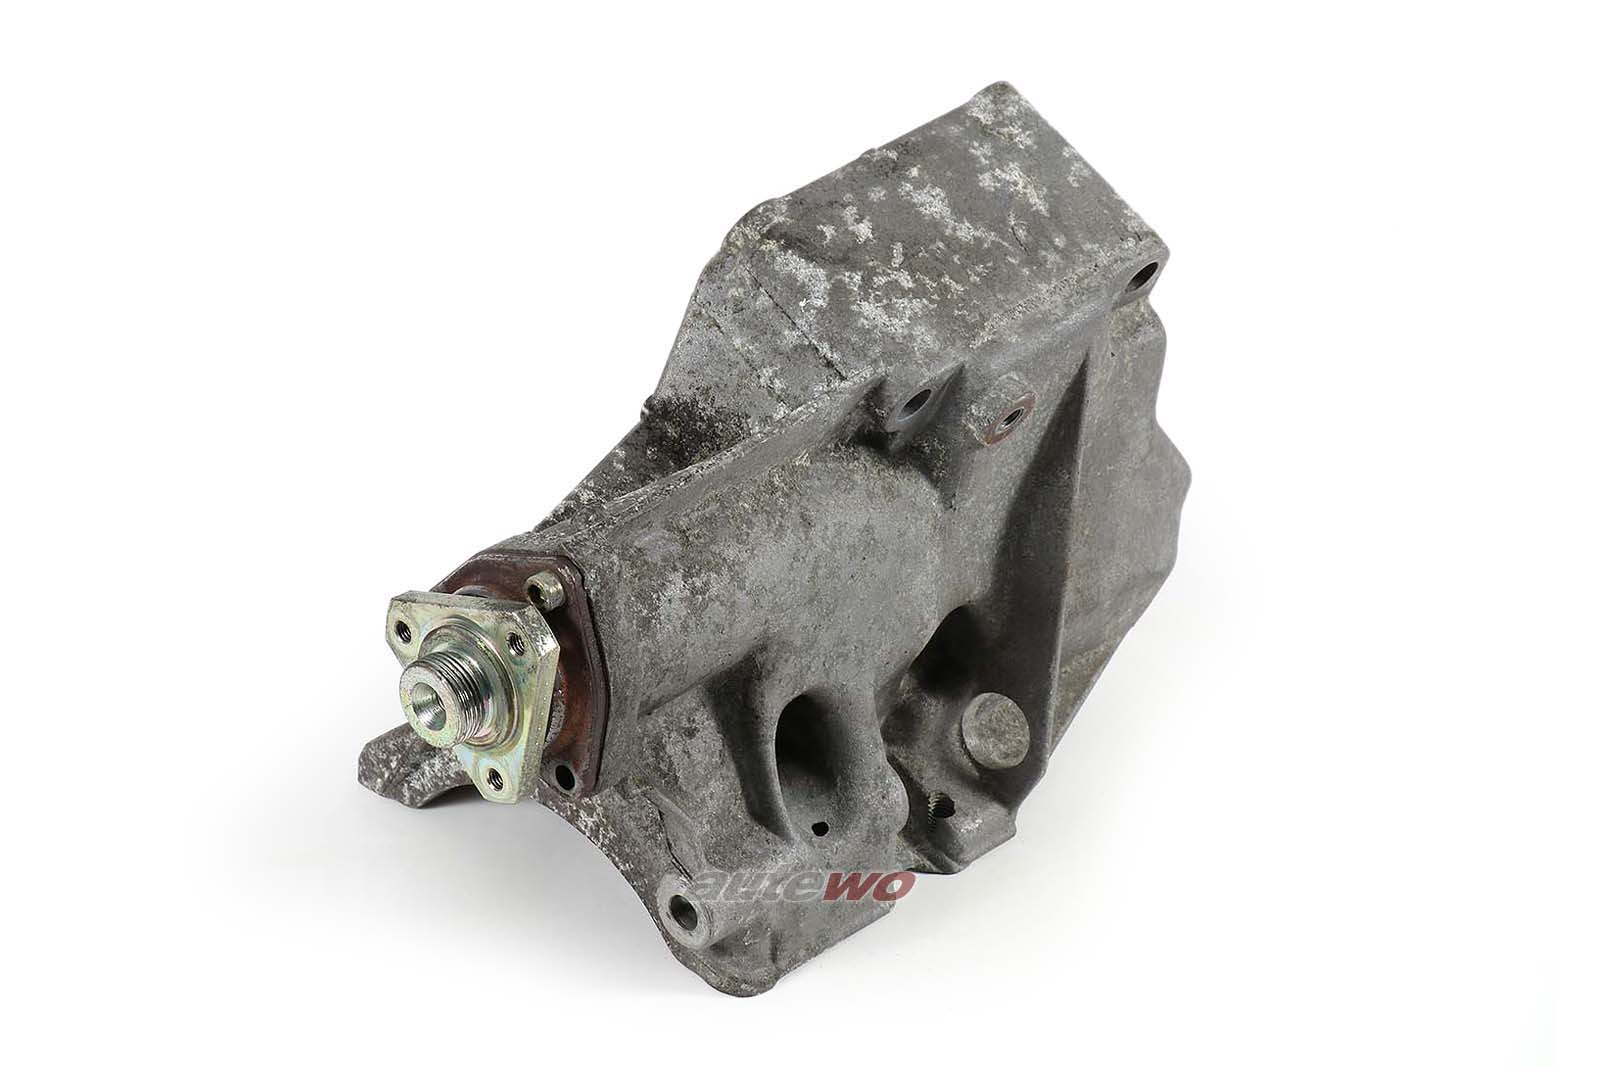 046903141D Audi 100/A6/S4/S6 C4 5 Zylinder Halter Lüfter/Klimakompressor